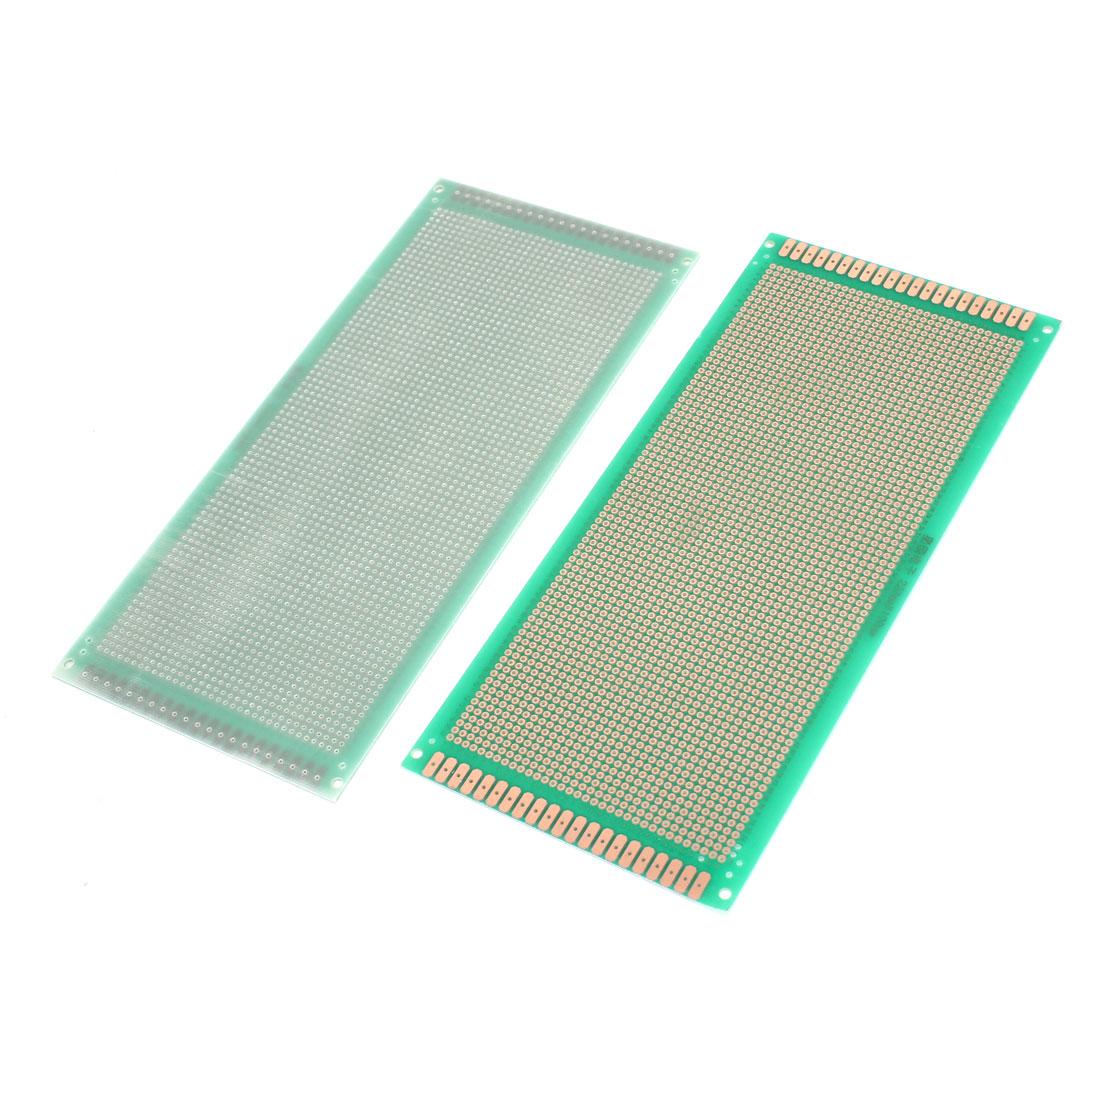 2 Pcs Single Side Circuit Prototype Universal PCB Board Breadboard Green 22x10cm